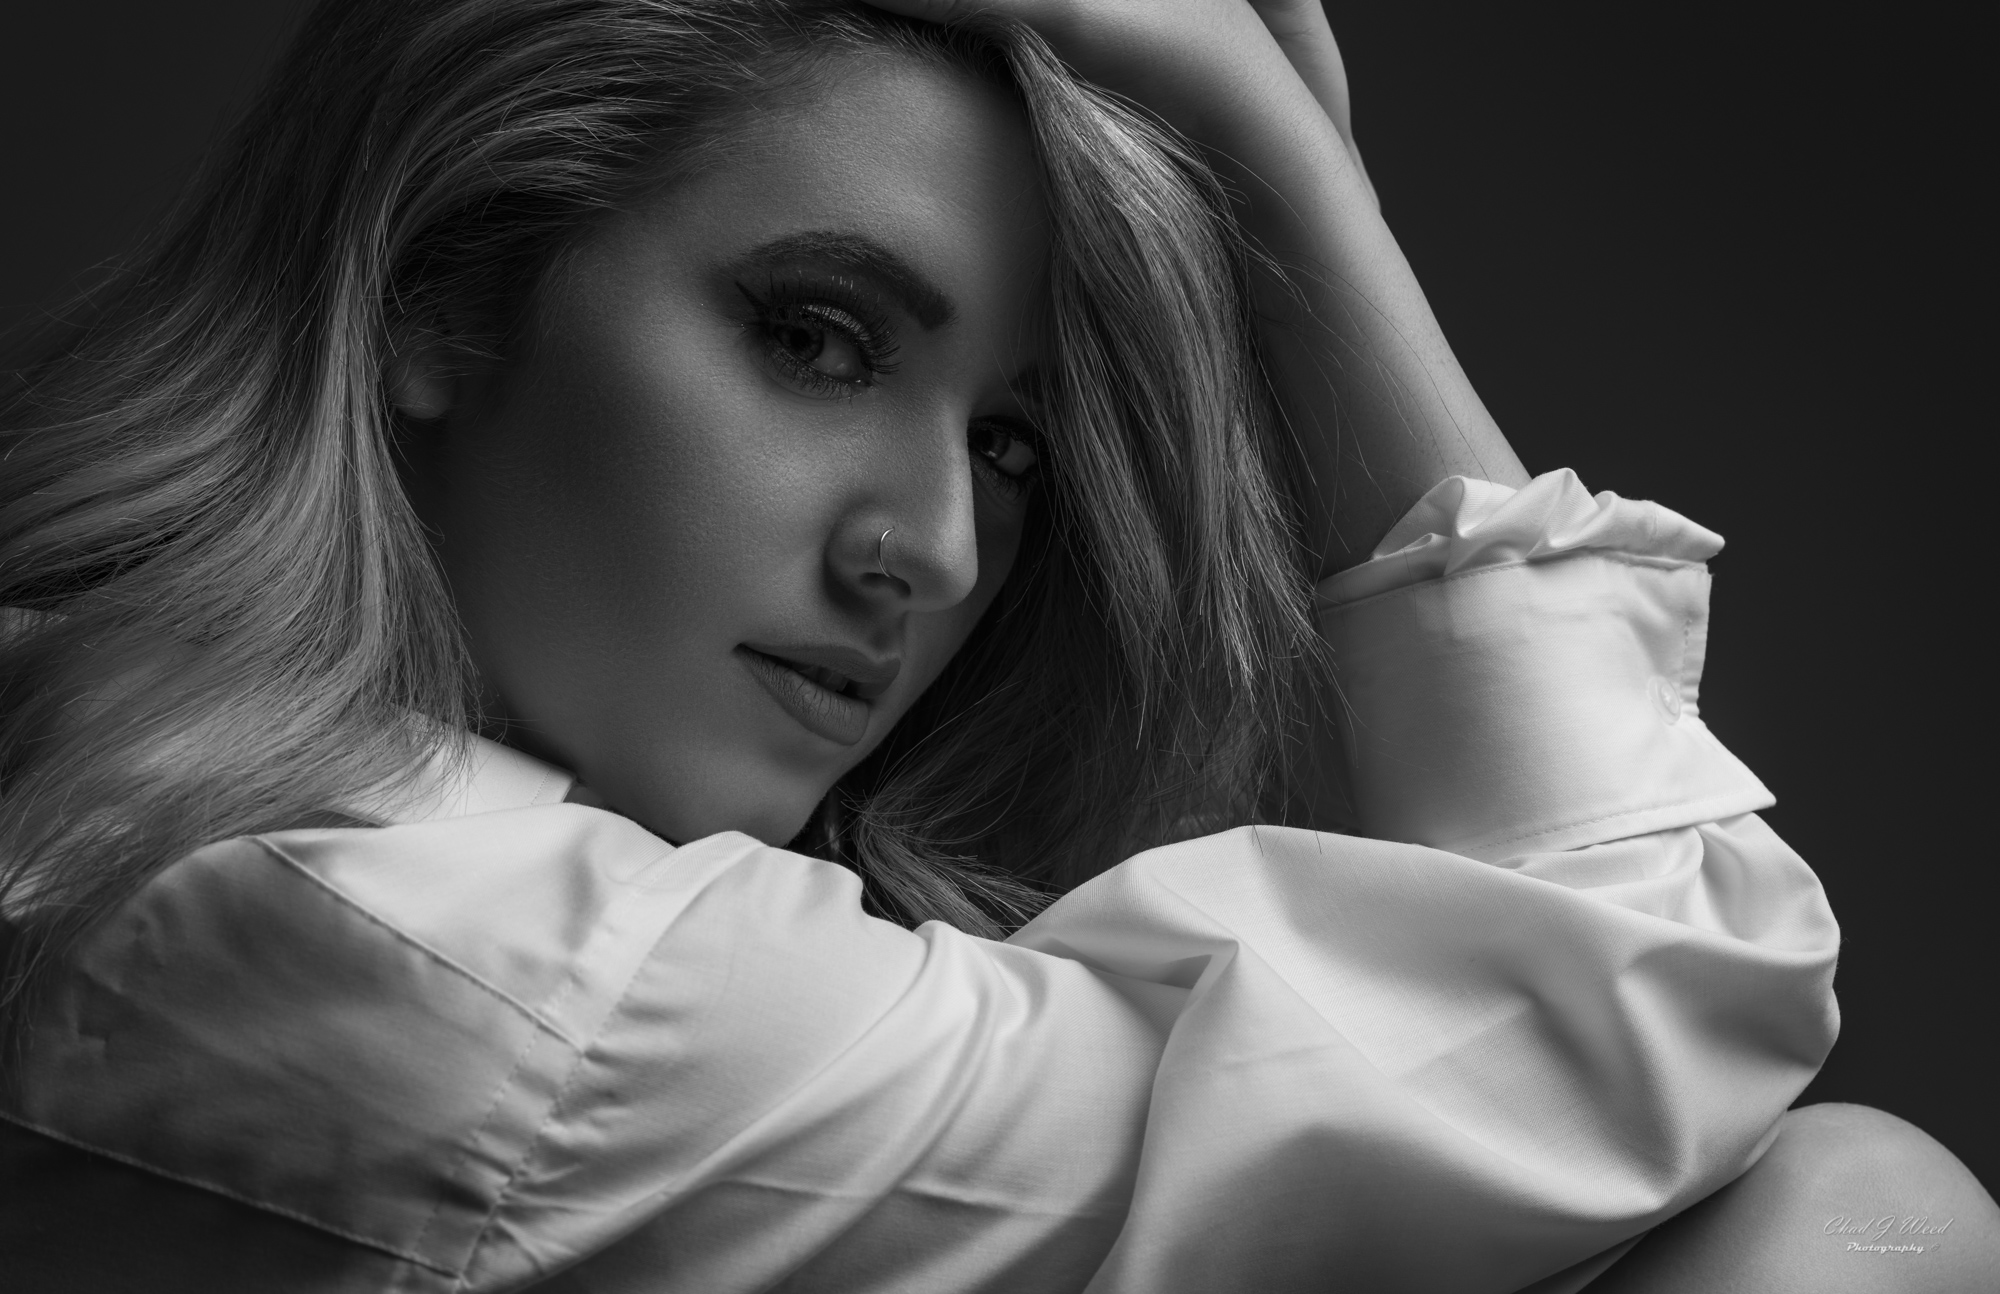 Amber Fashion Model by Arizona Fashion Portrait Photographer Chad Weed